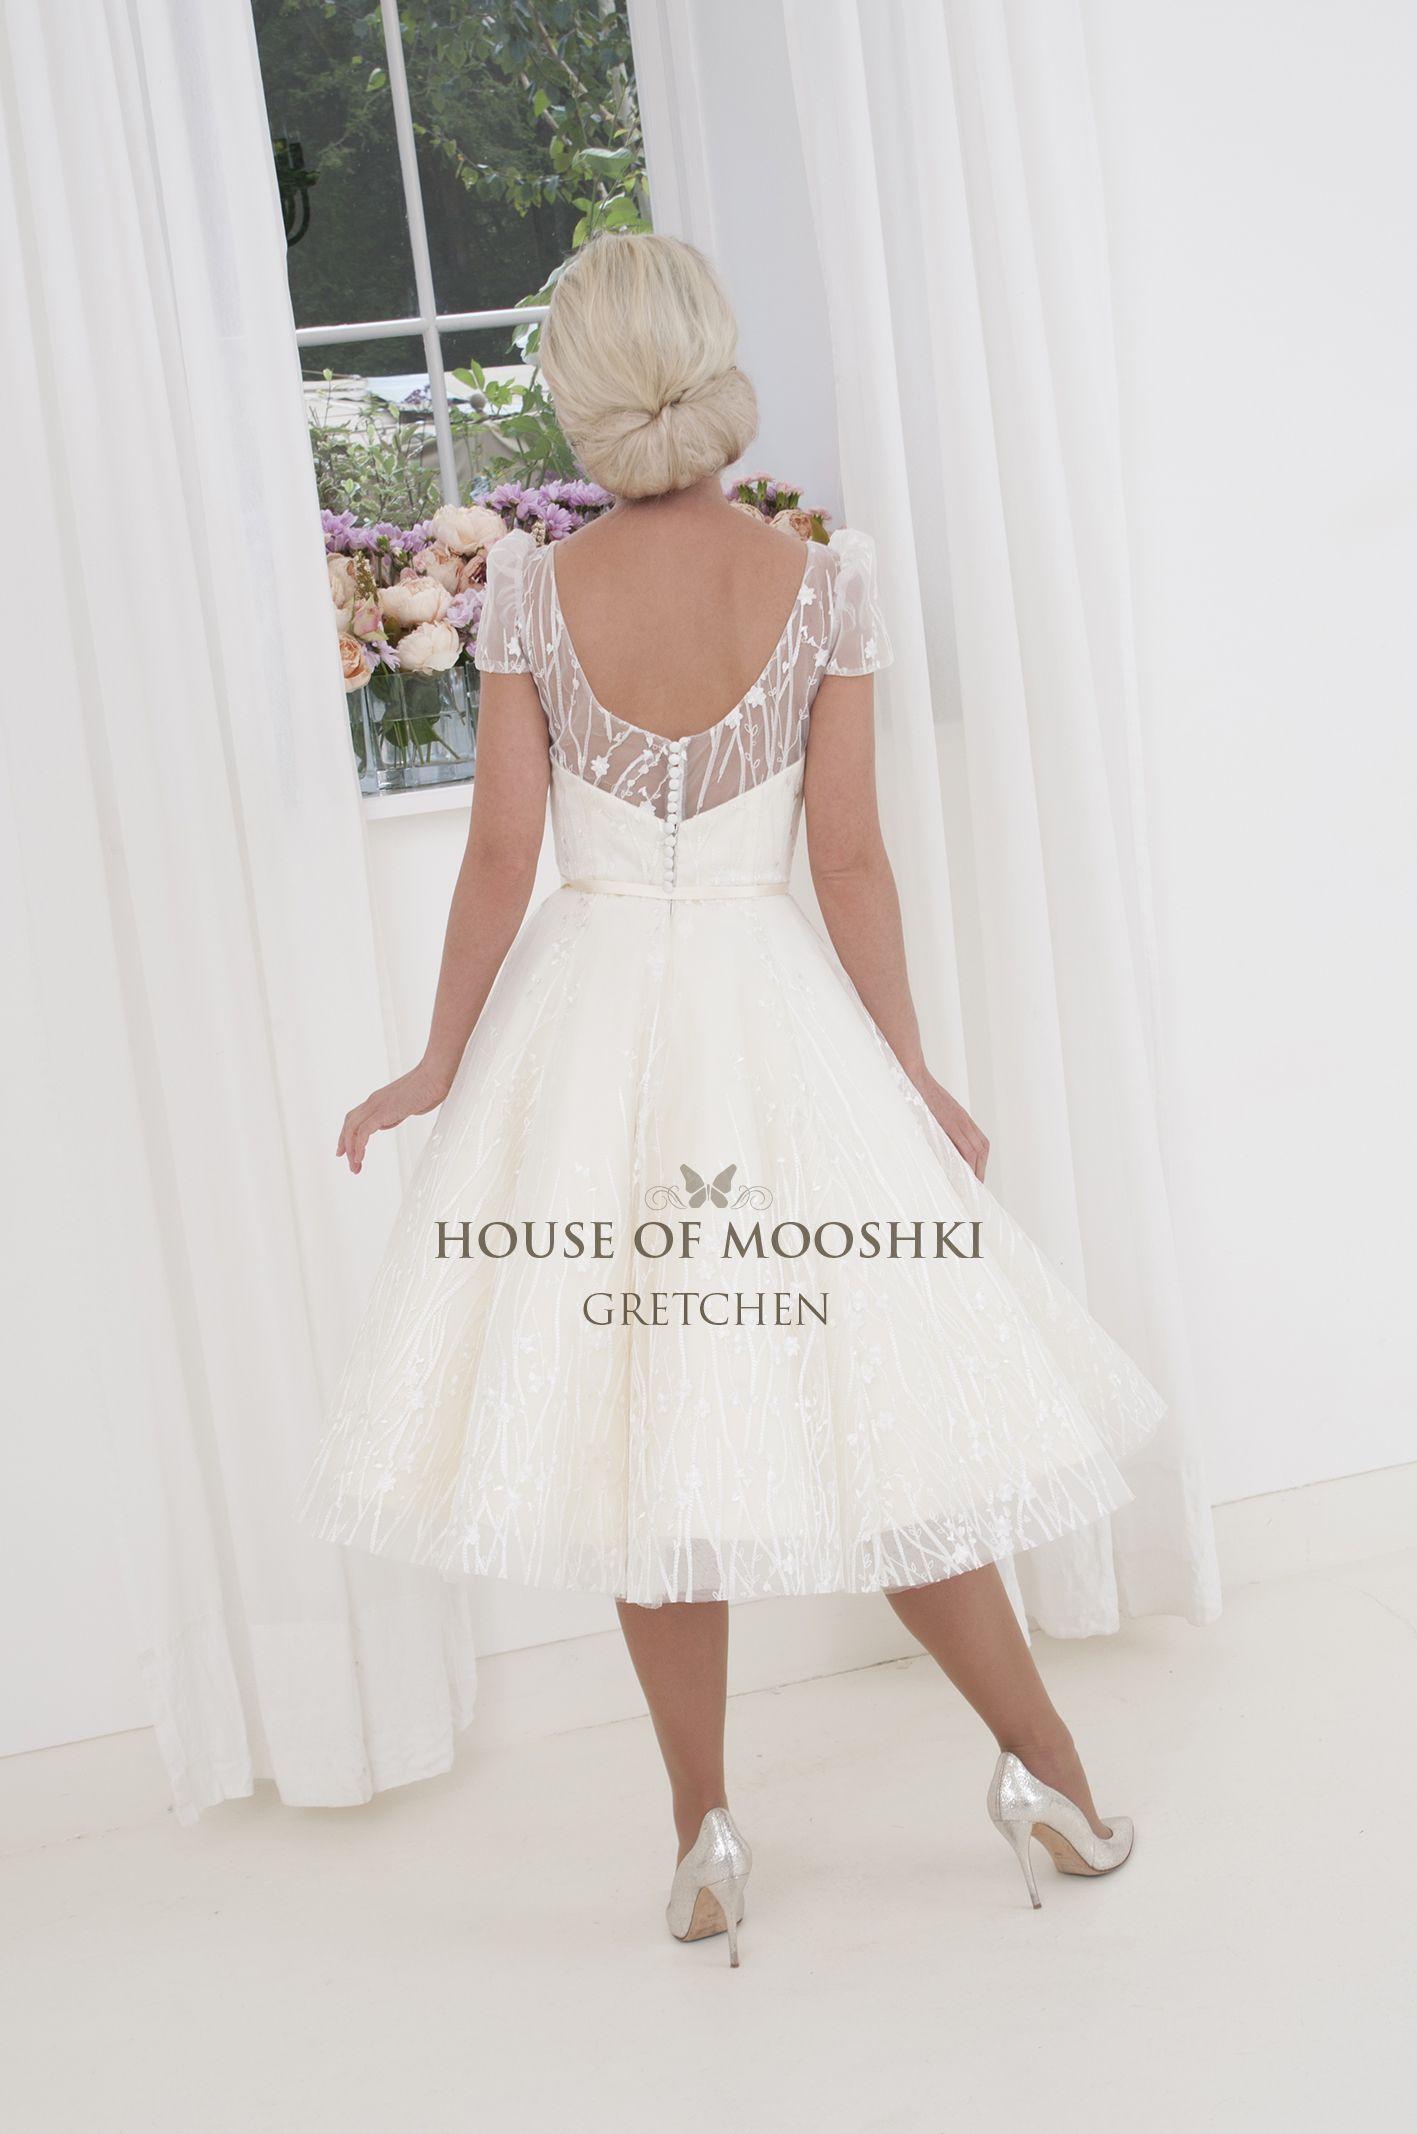 Gretchen perfect little cuteypie tea length wedding dress with